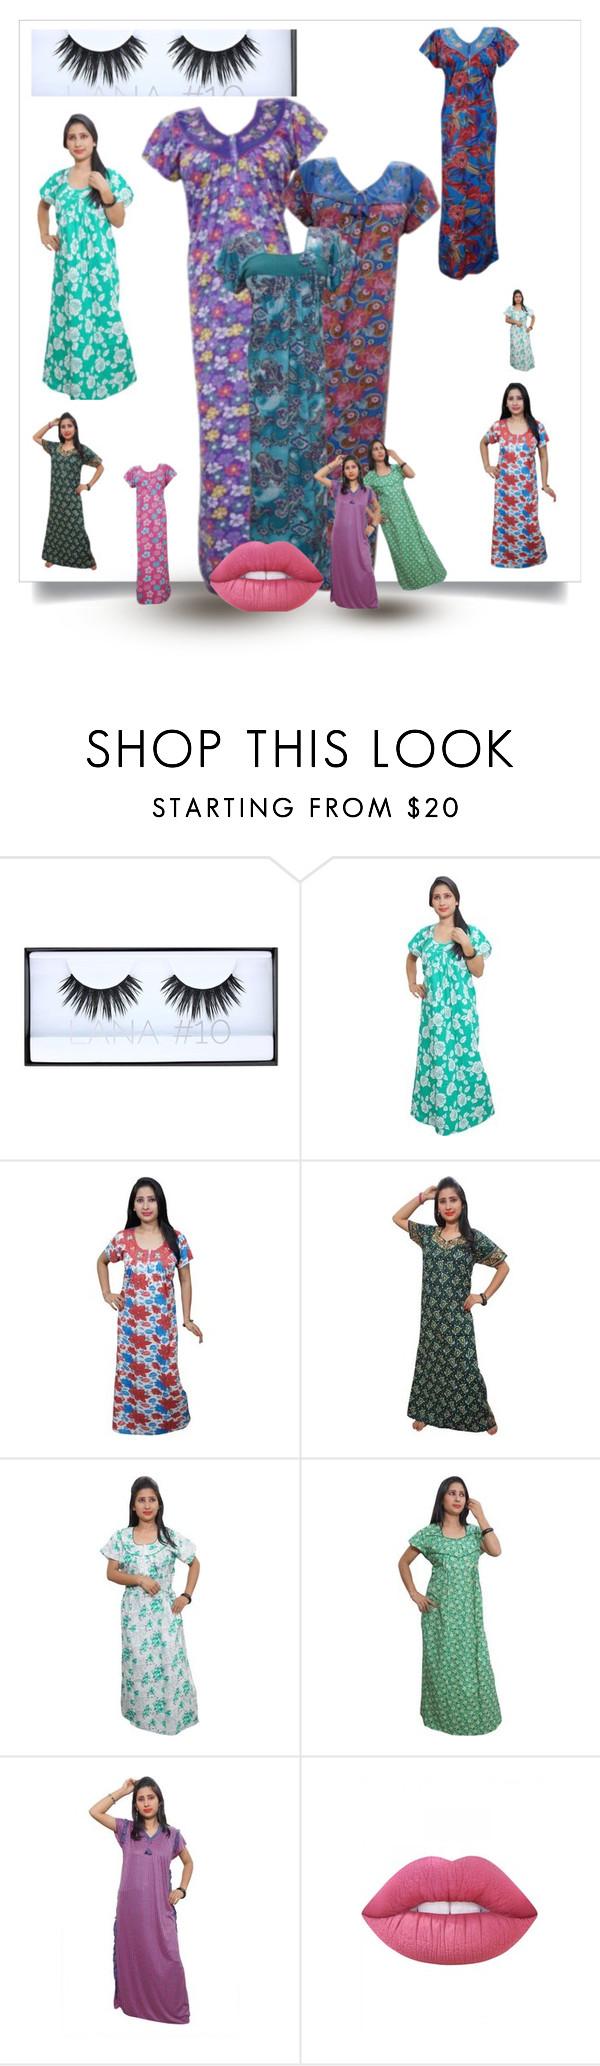 NIGHWEAR MAXI DRESS by globaltrendzs-flipkart on Polyvore featuring Lime Crime  http://www.polyvore.com/cgi/set?id=199505027  #nighty #womensnighty #maxi #nightwear #nightgown #nightdress #summer #sleepwear #fashion